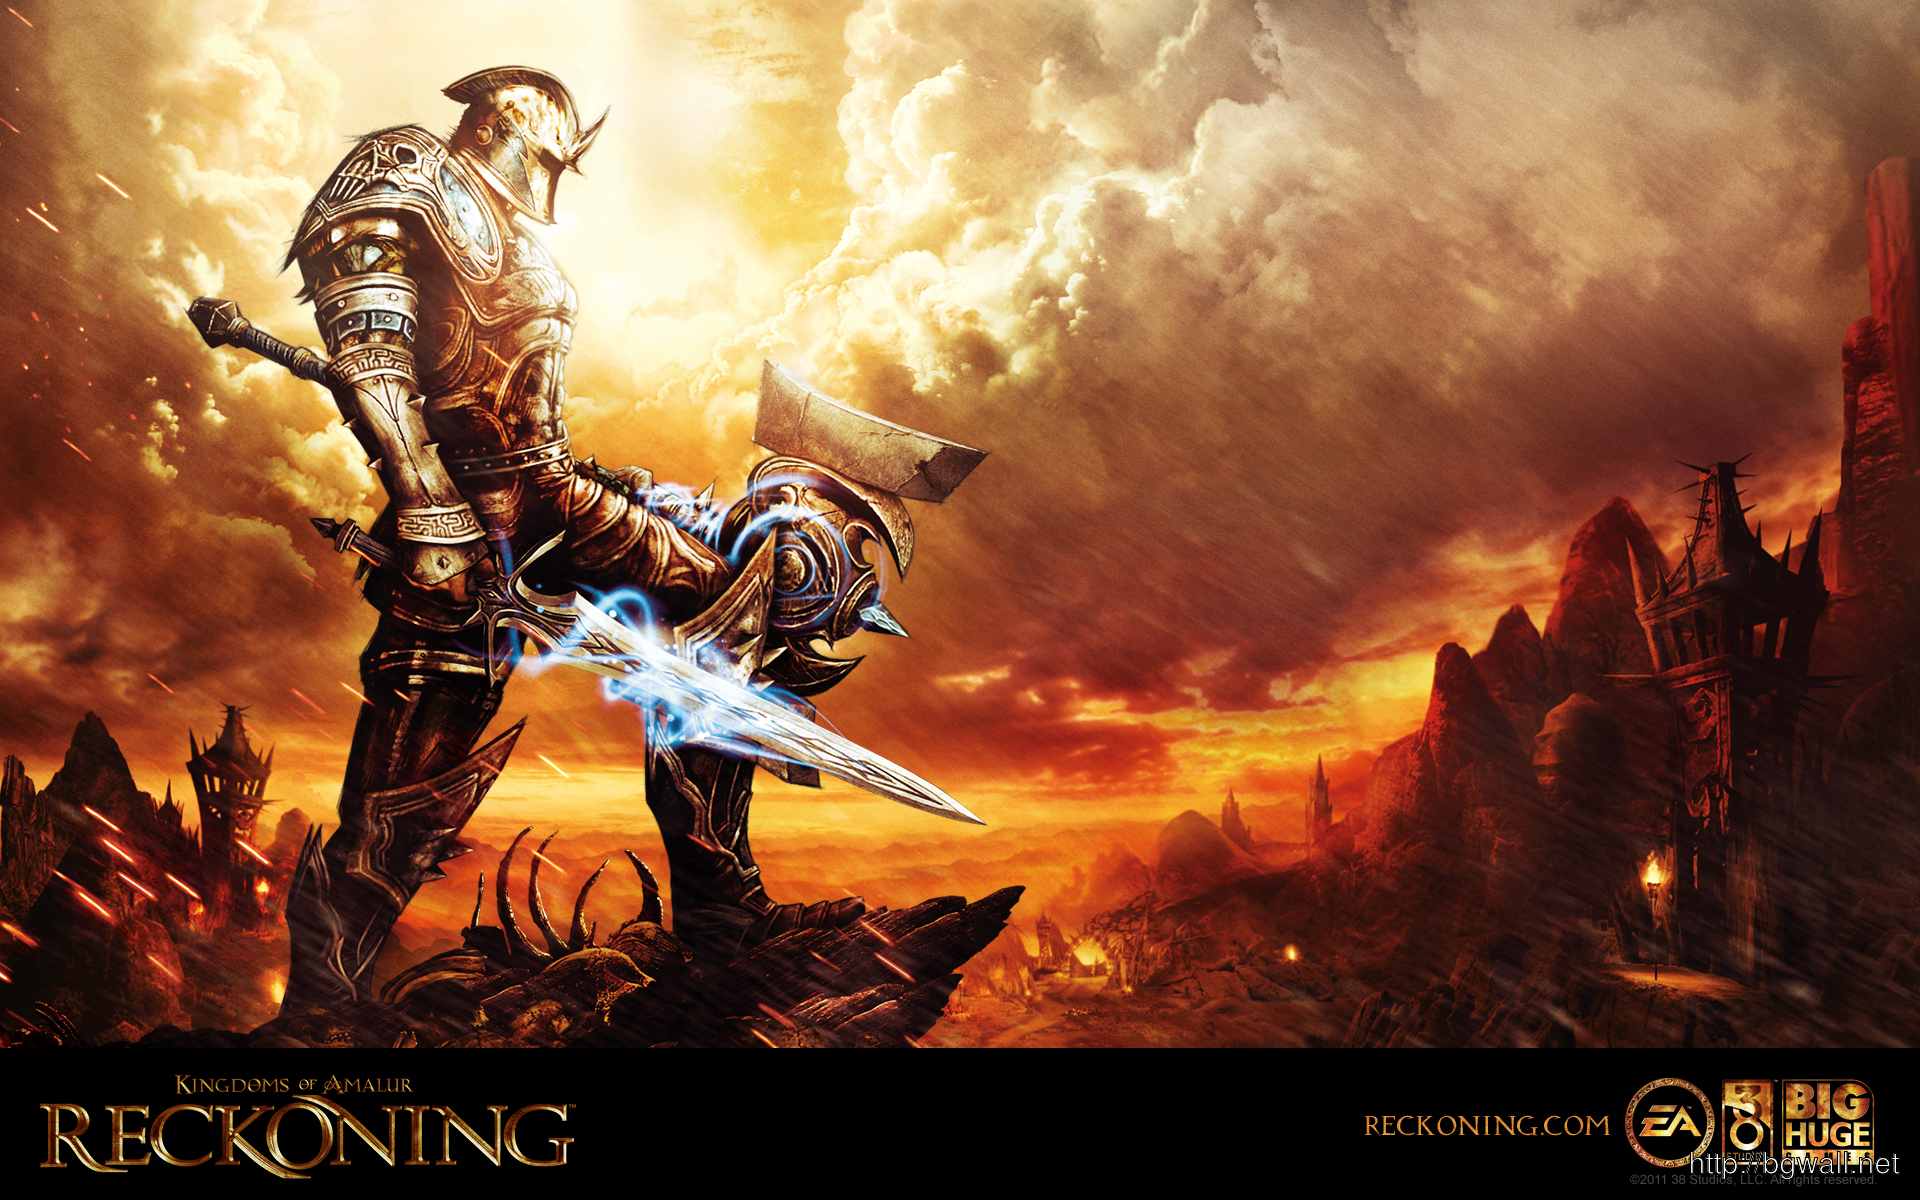 Download Kingdoms Of Amalur Reckoning Wallpaper Wide High Resolution Full Size